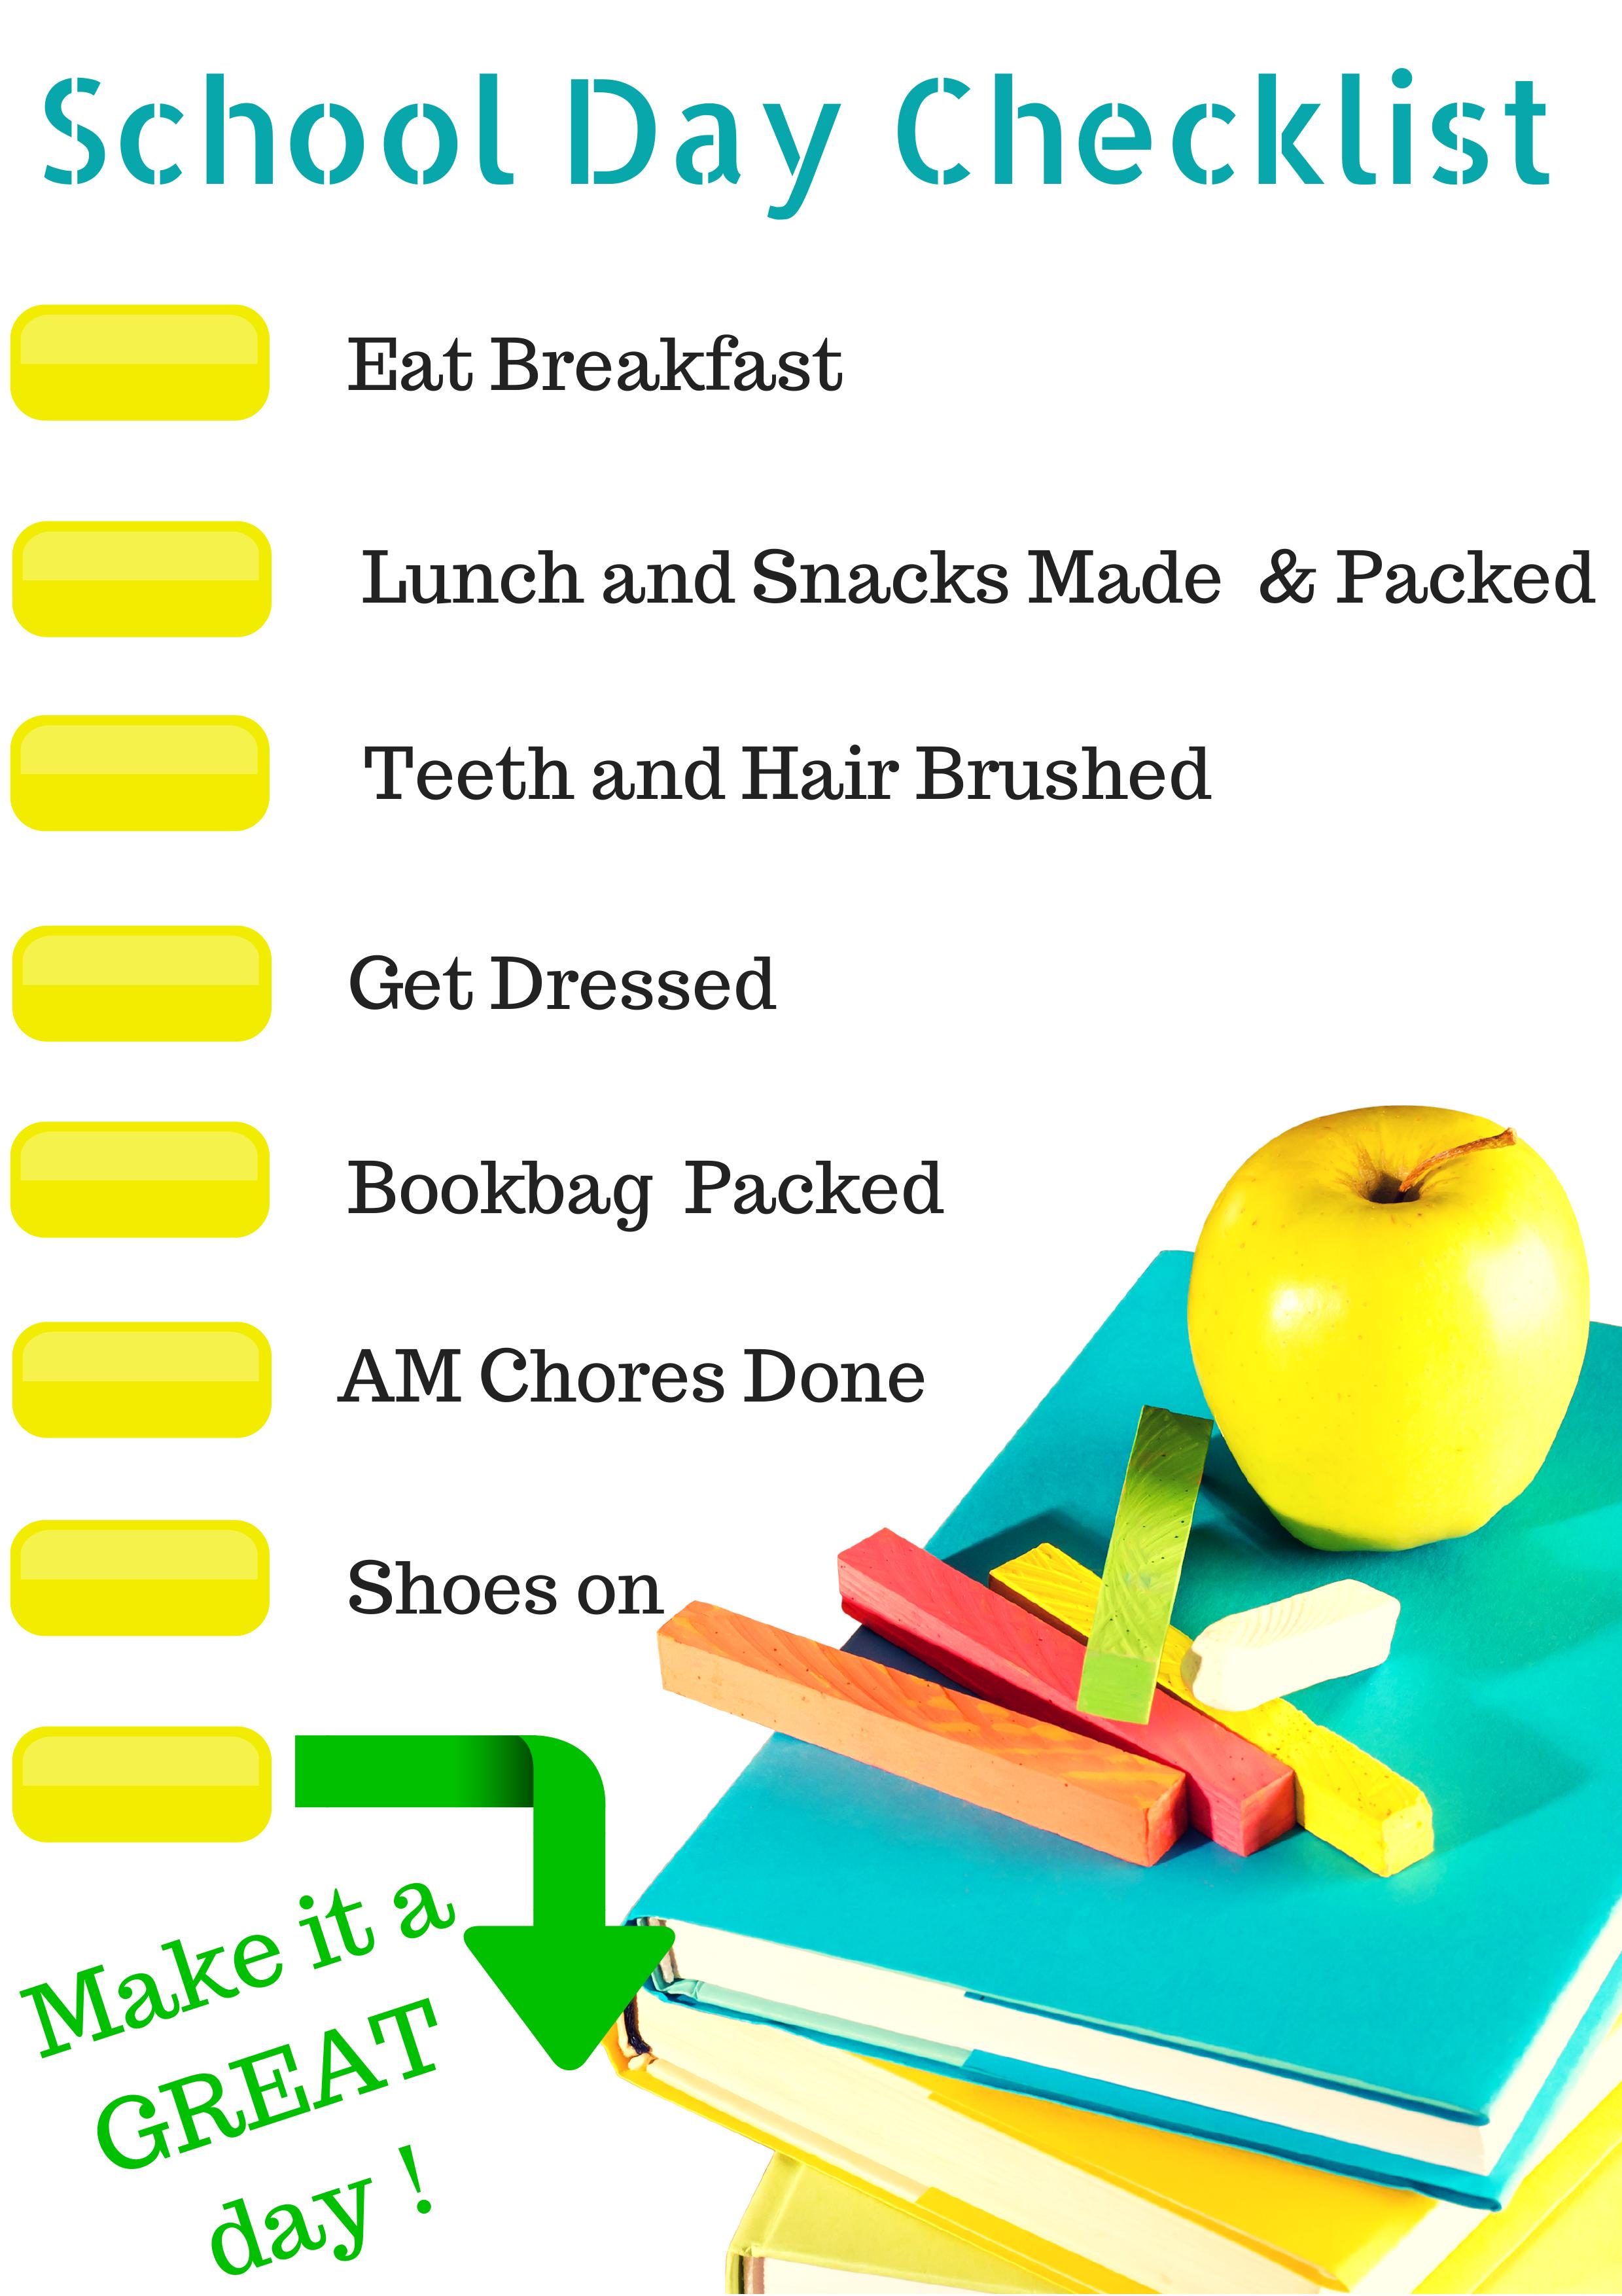 School Morning Routine Checklist Free Printable - Farmeru0027s Wife Rambles - PNG Morning Routine